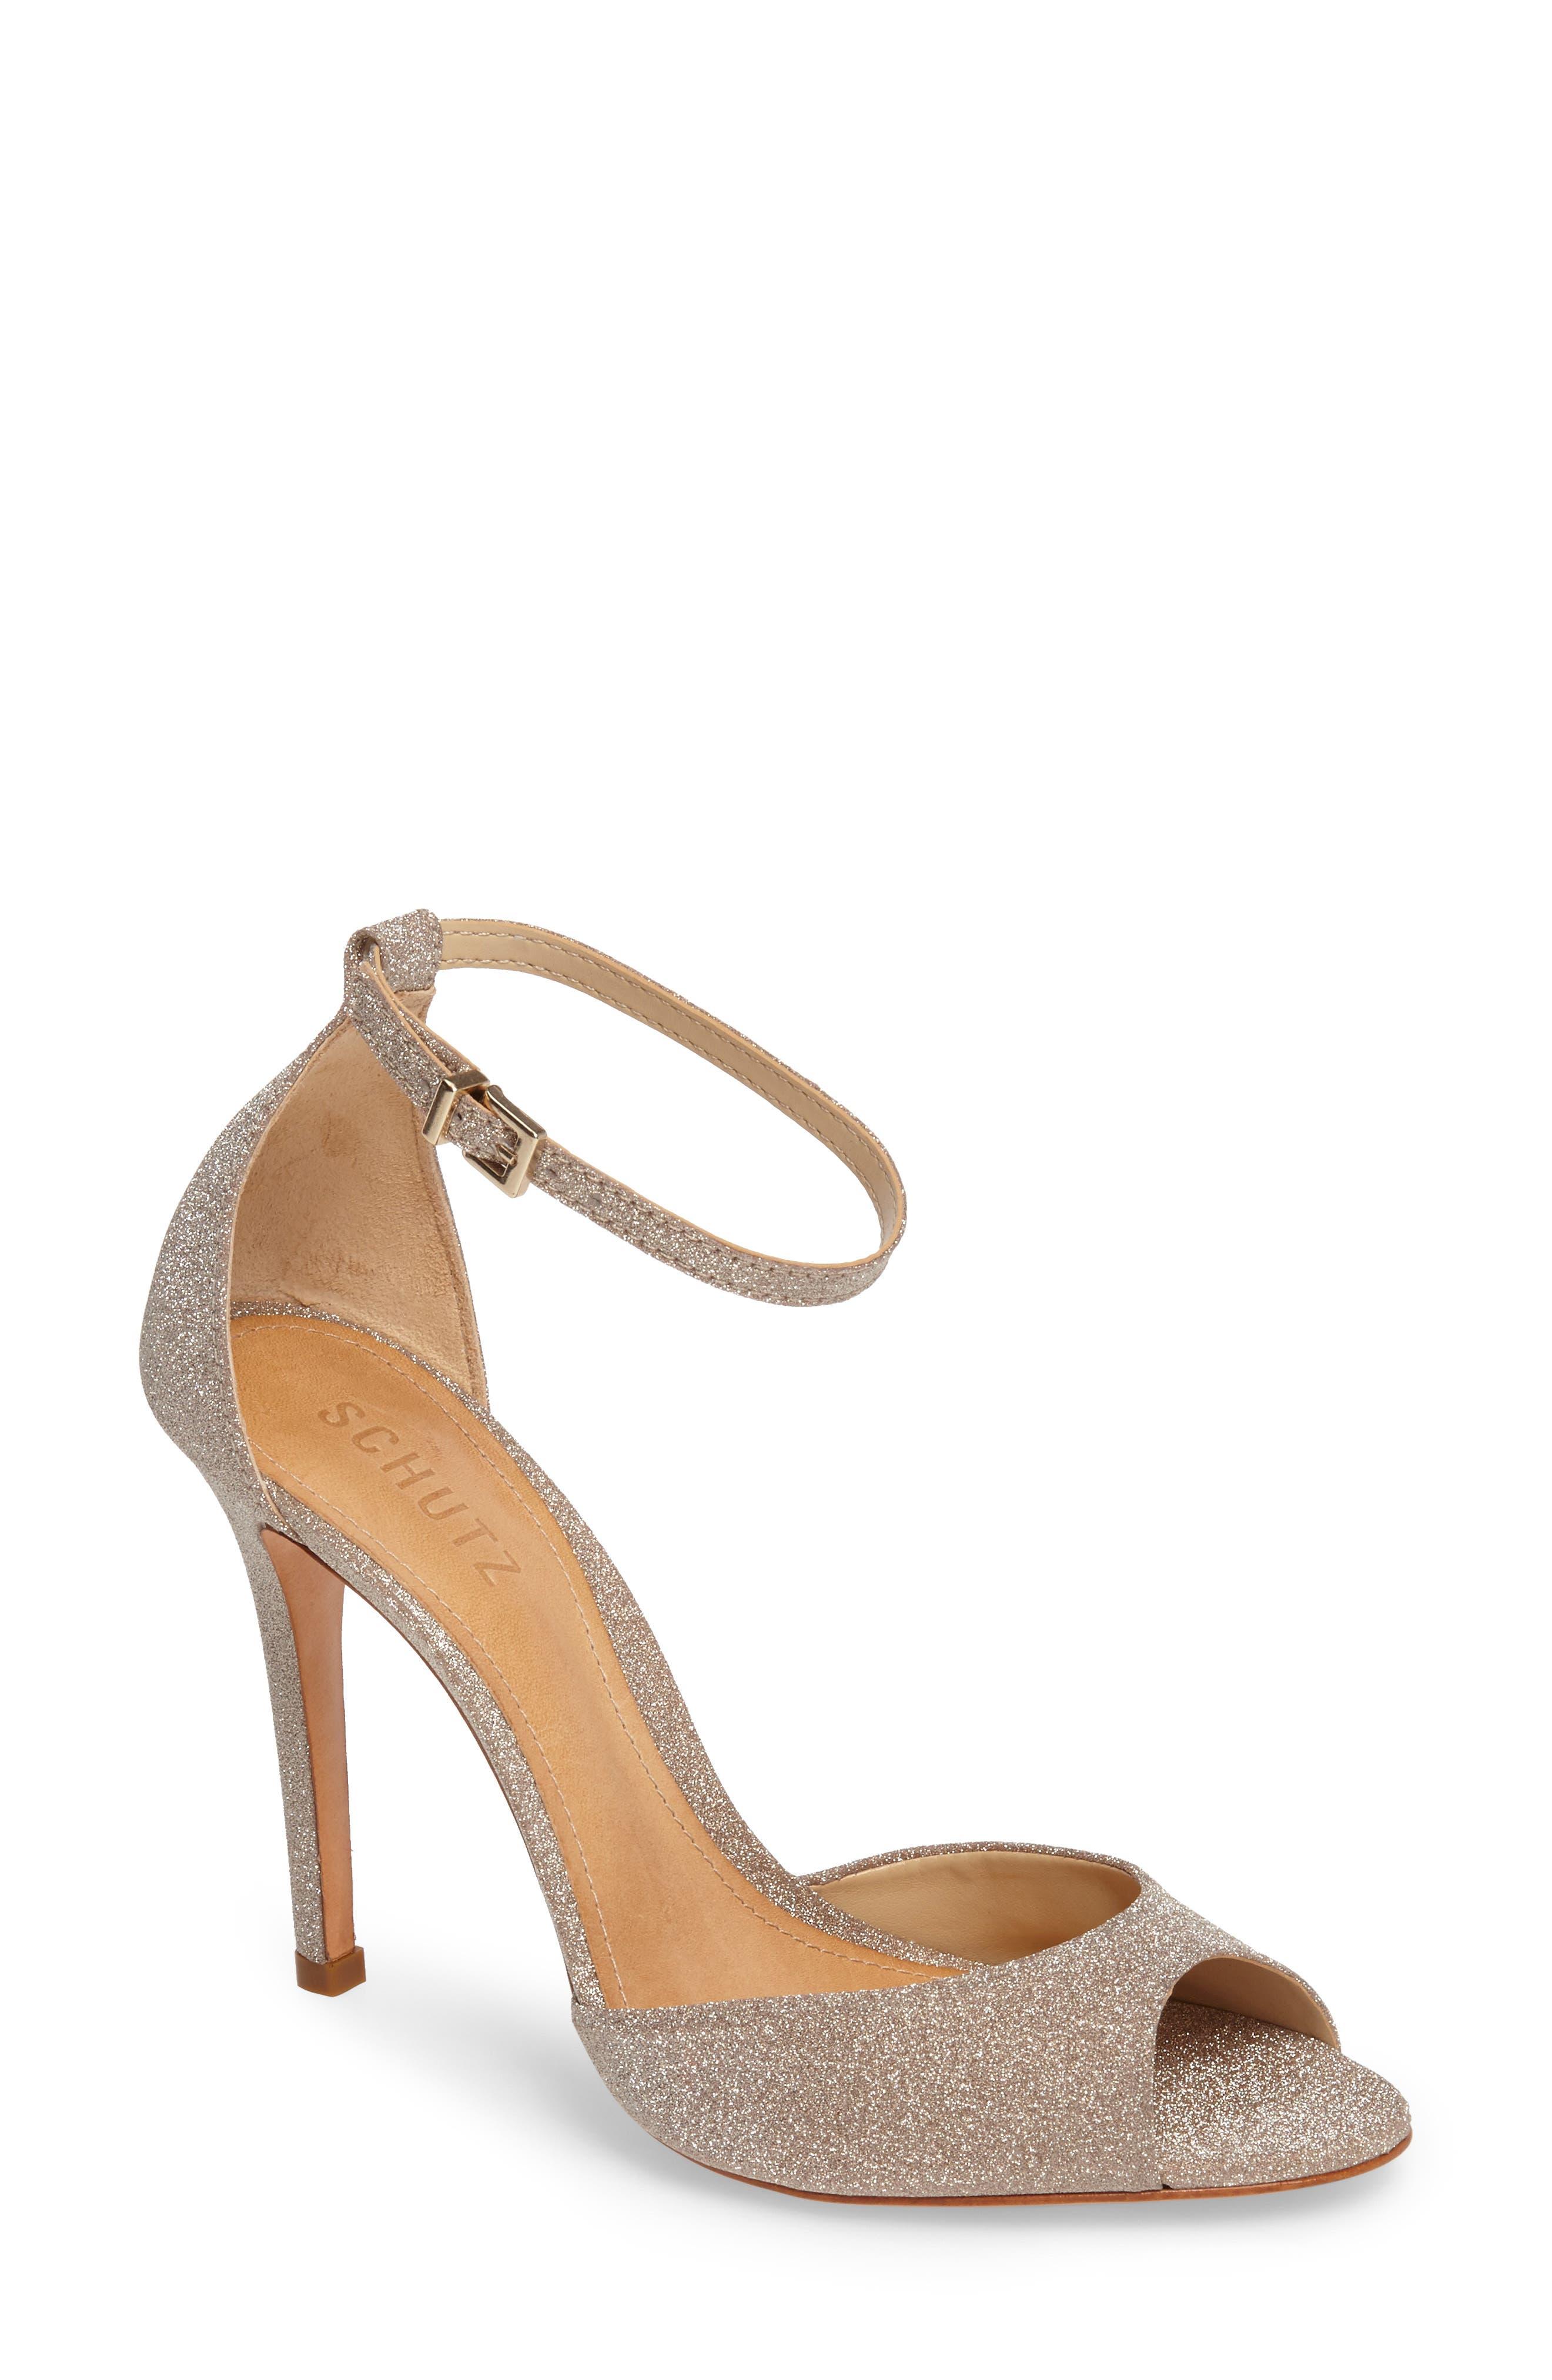 Alternate Image 1 Selected - Schutz Saasha Lee Ankle Strap Sandal (Women)